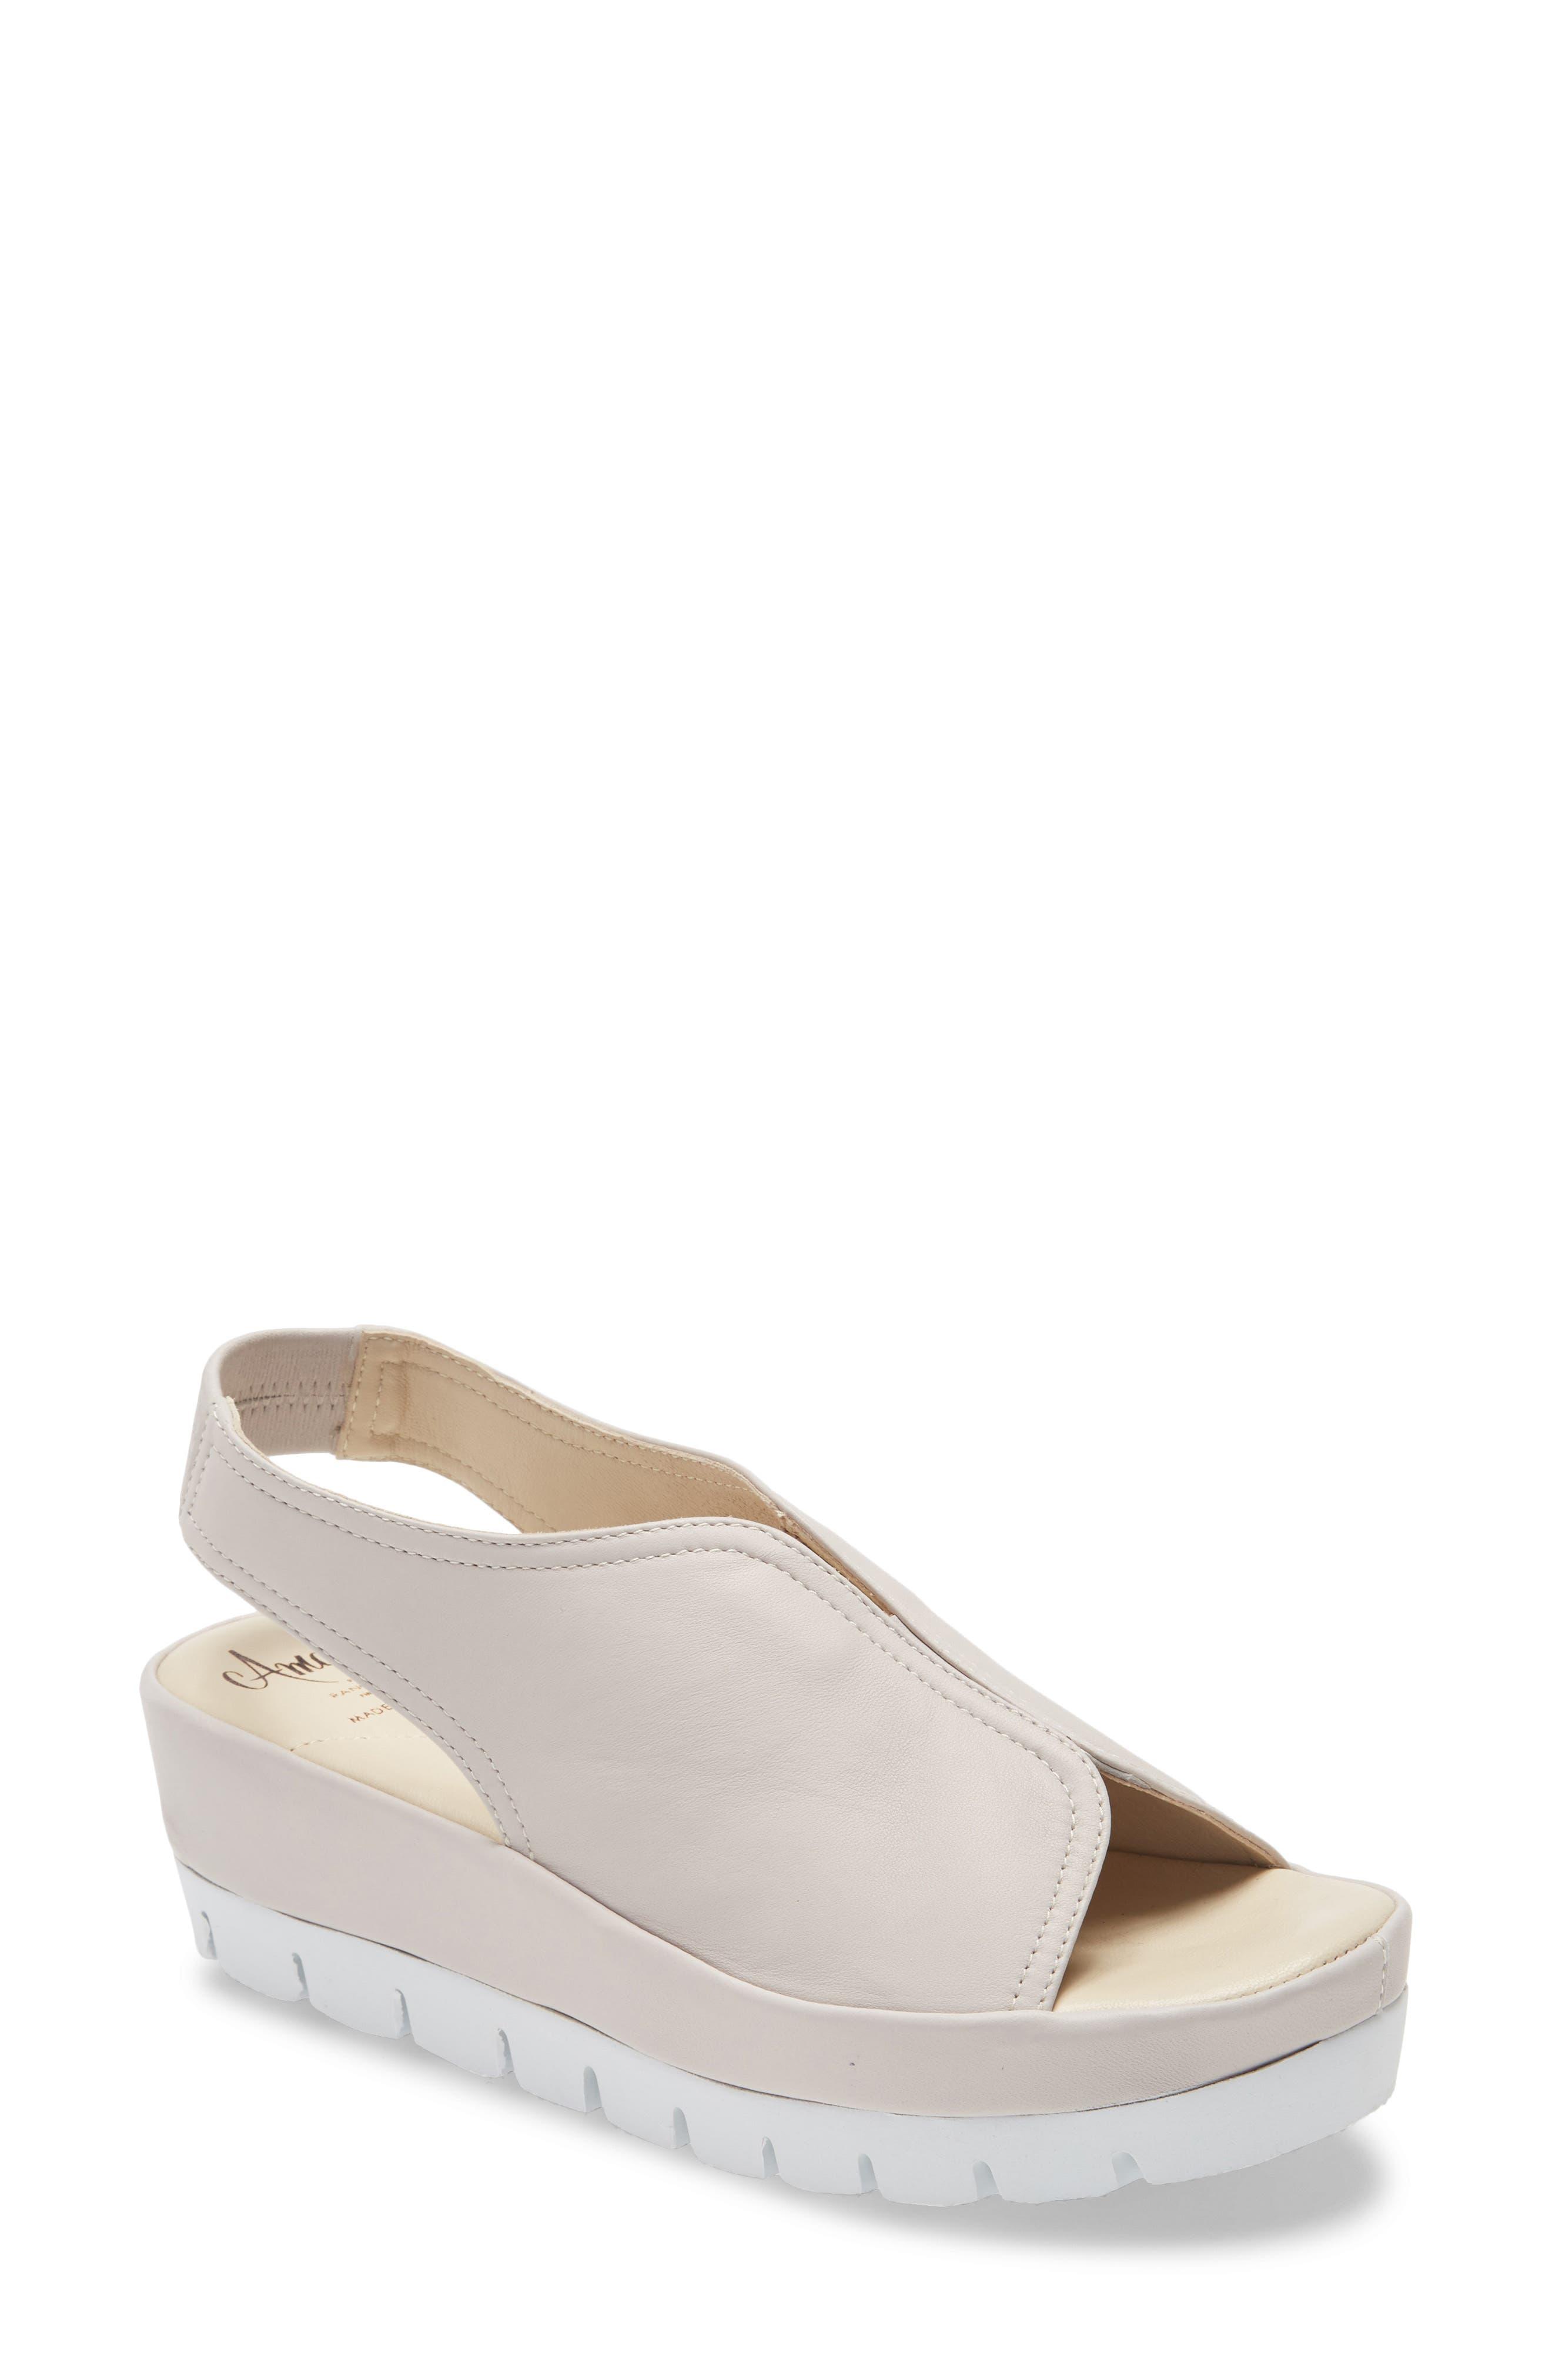 Bassano Slingback Wedge Sandal